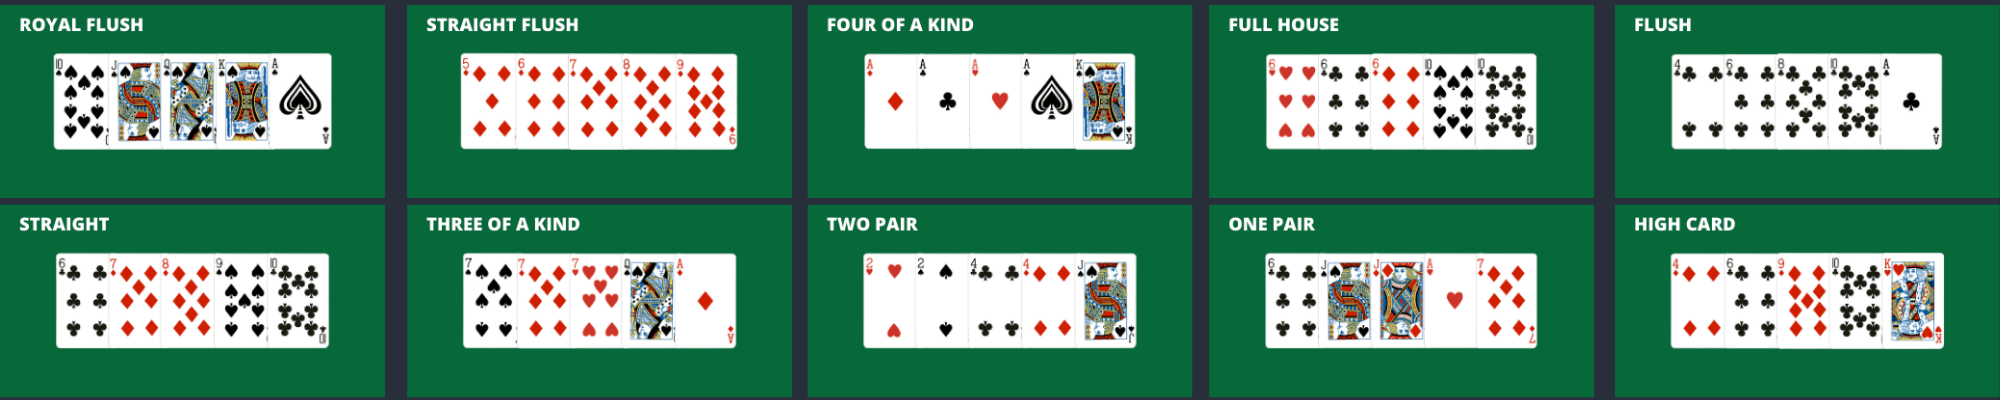 The Best Texas Hold'em Poker Hands Rankings in Order